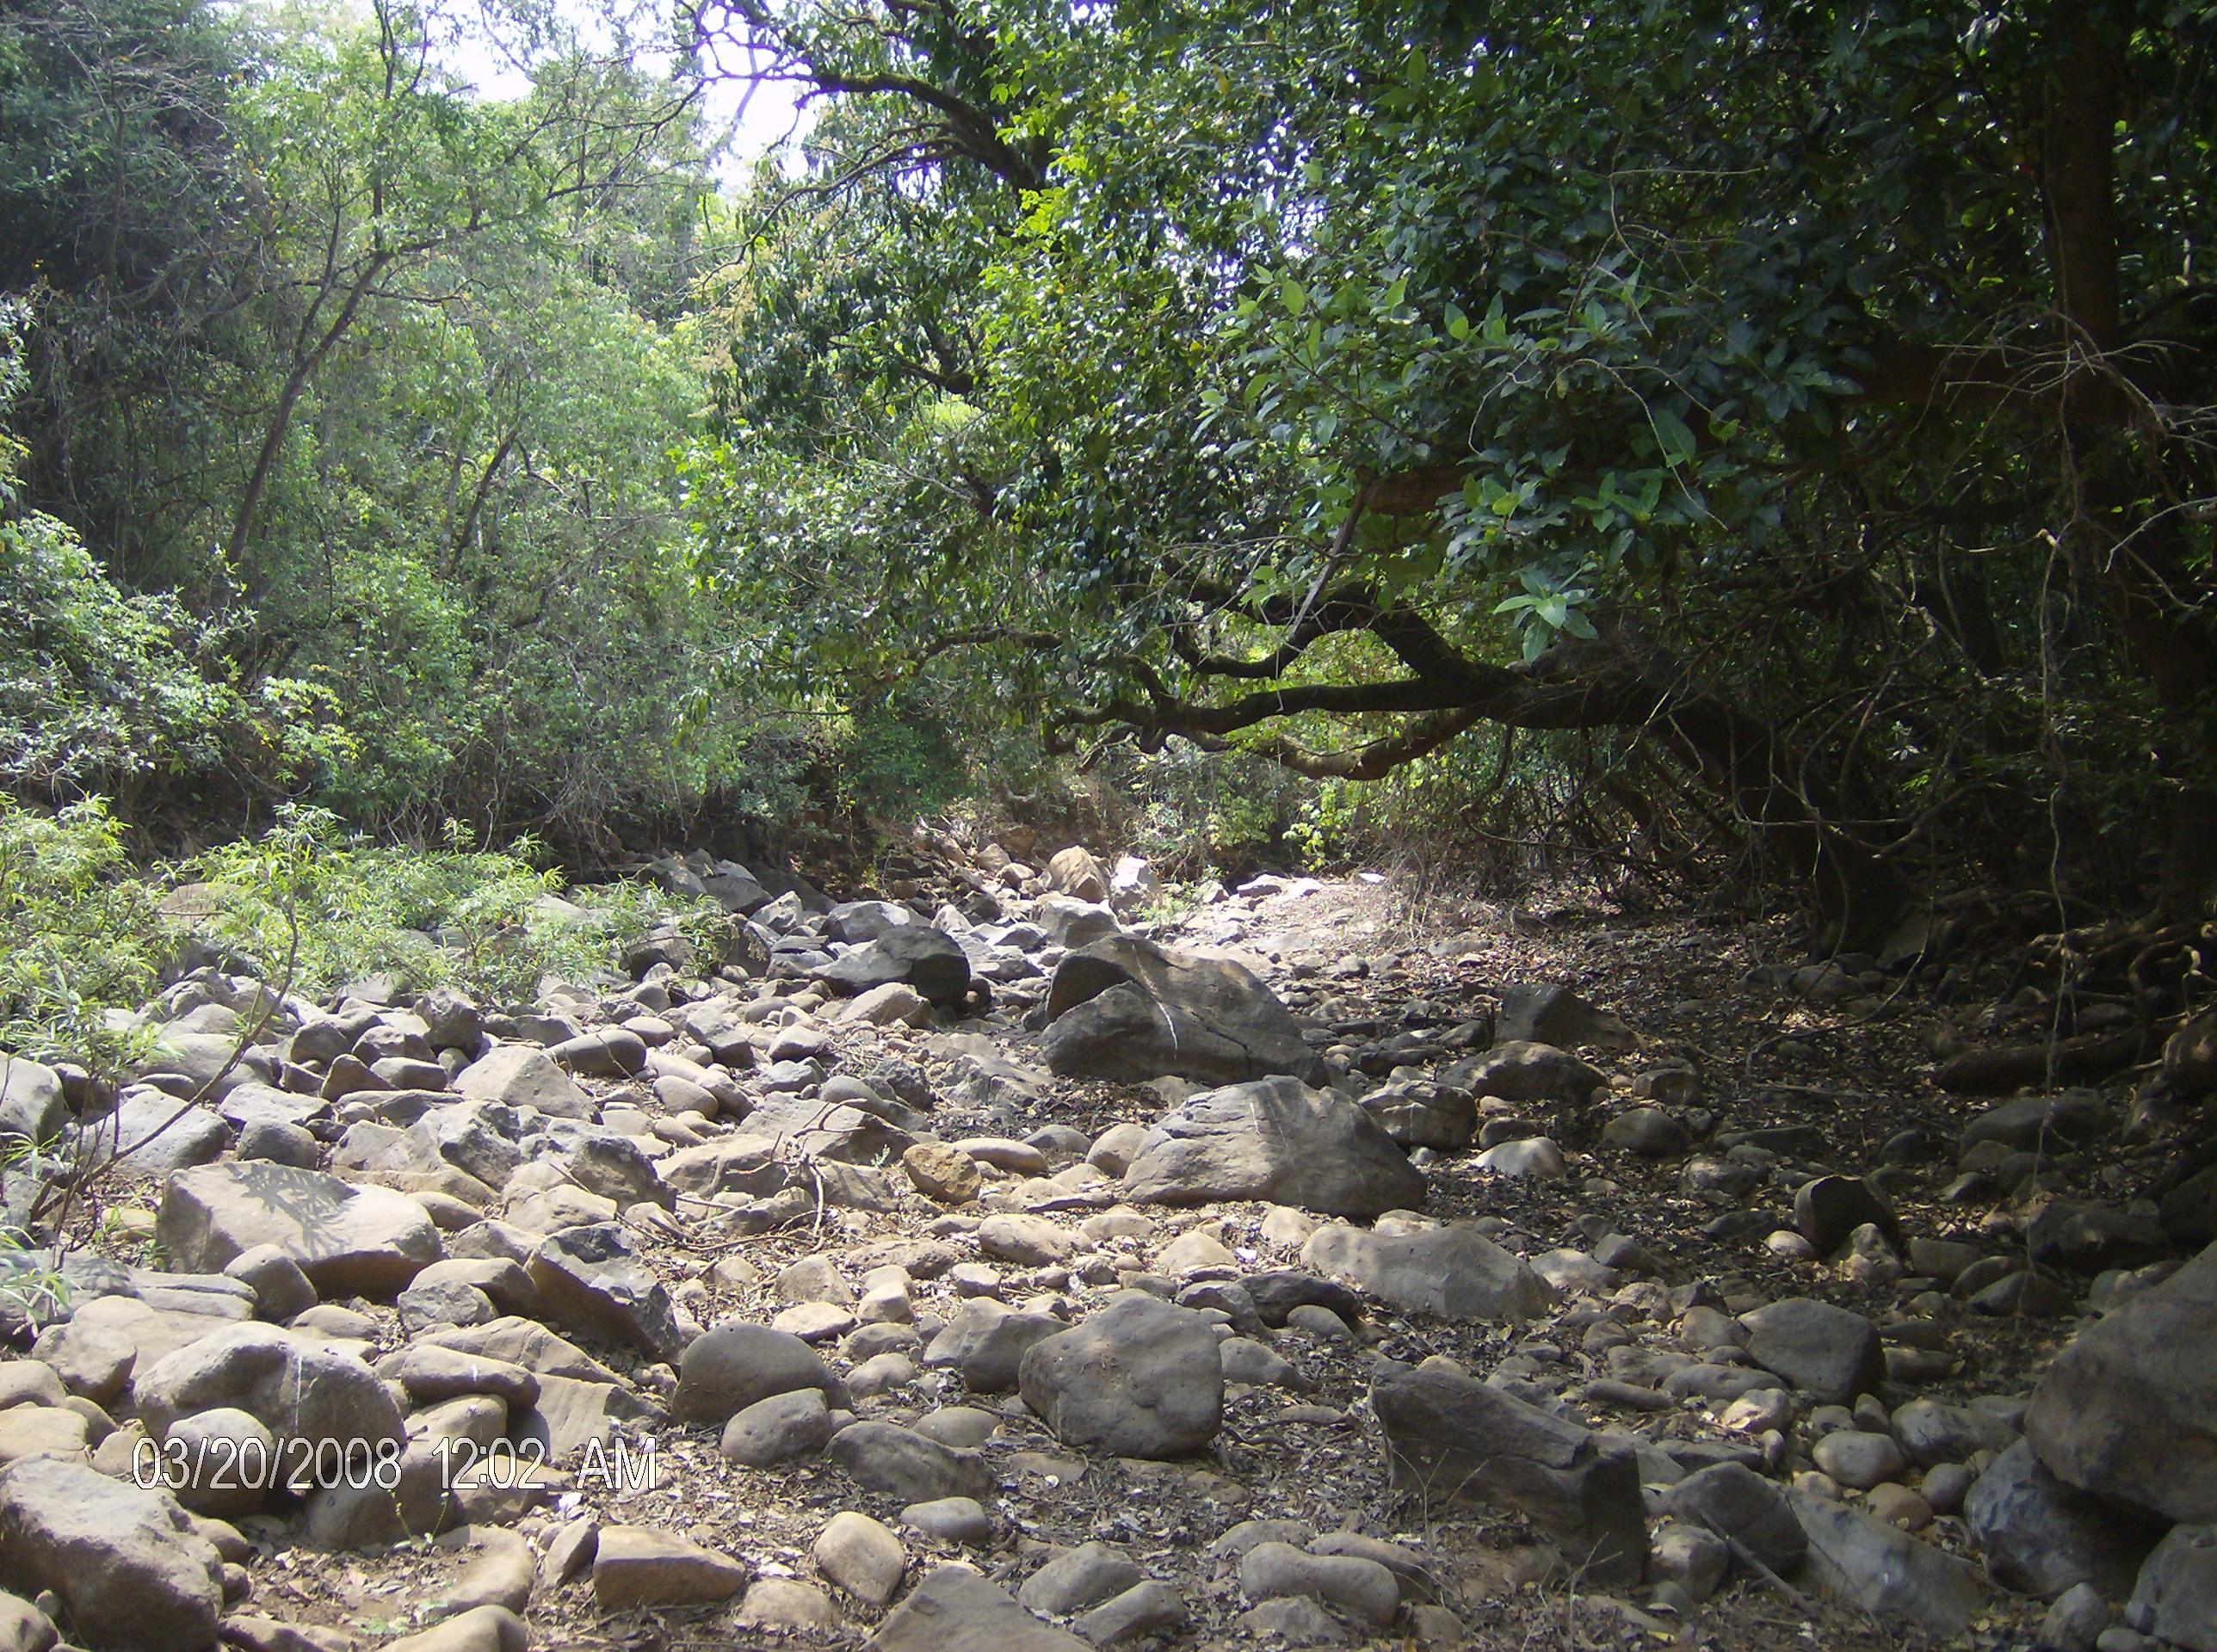 Rocky woodland, Forest, Landscape, Nature, Plants, HQ Photo